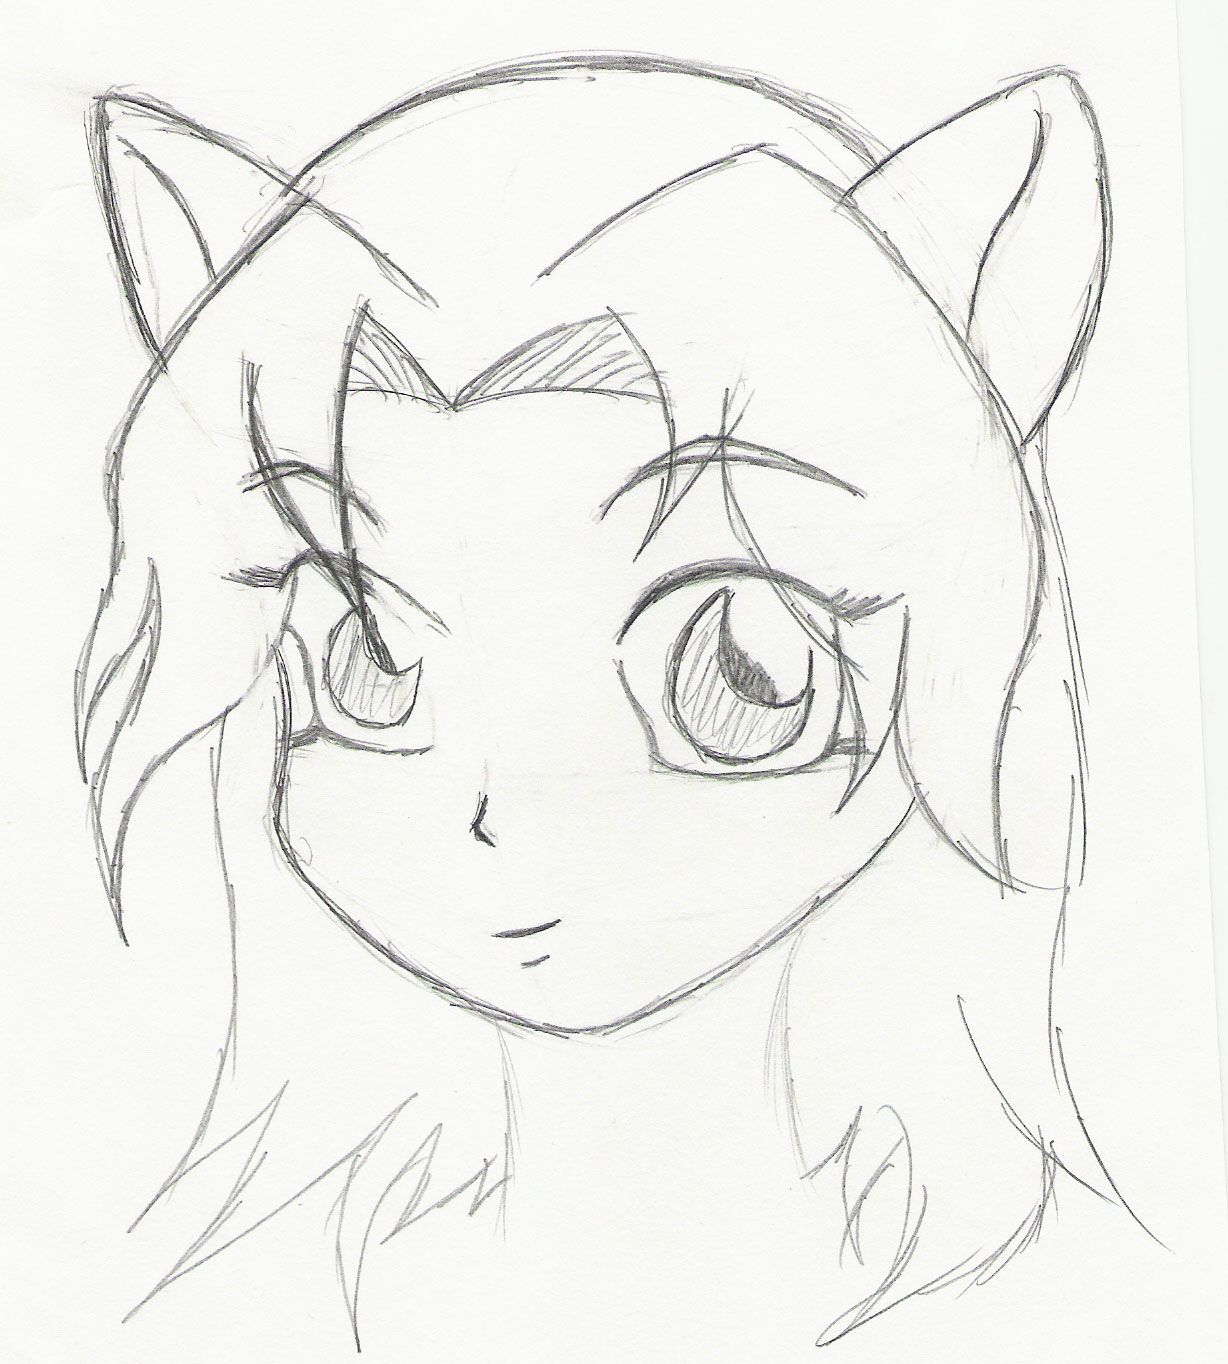 differnt drawing styles manga drawing myself anime style